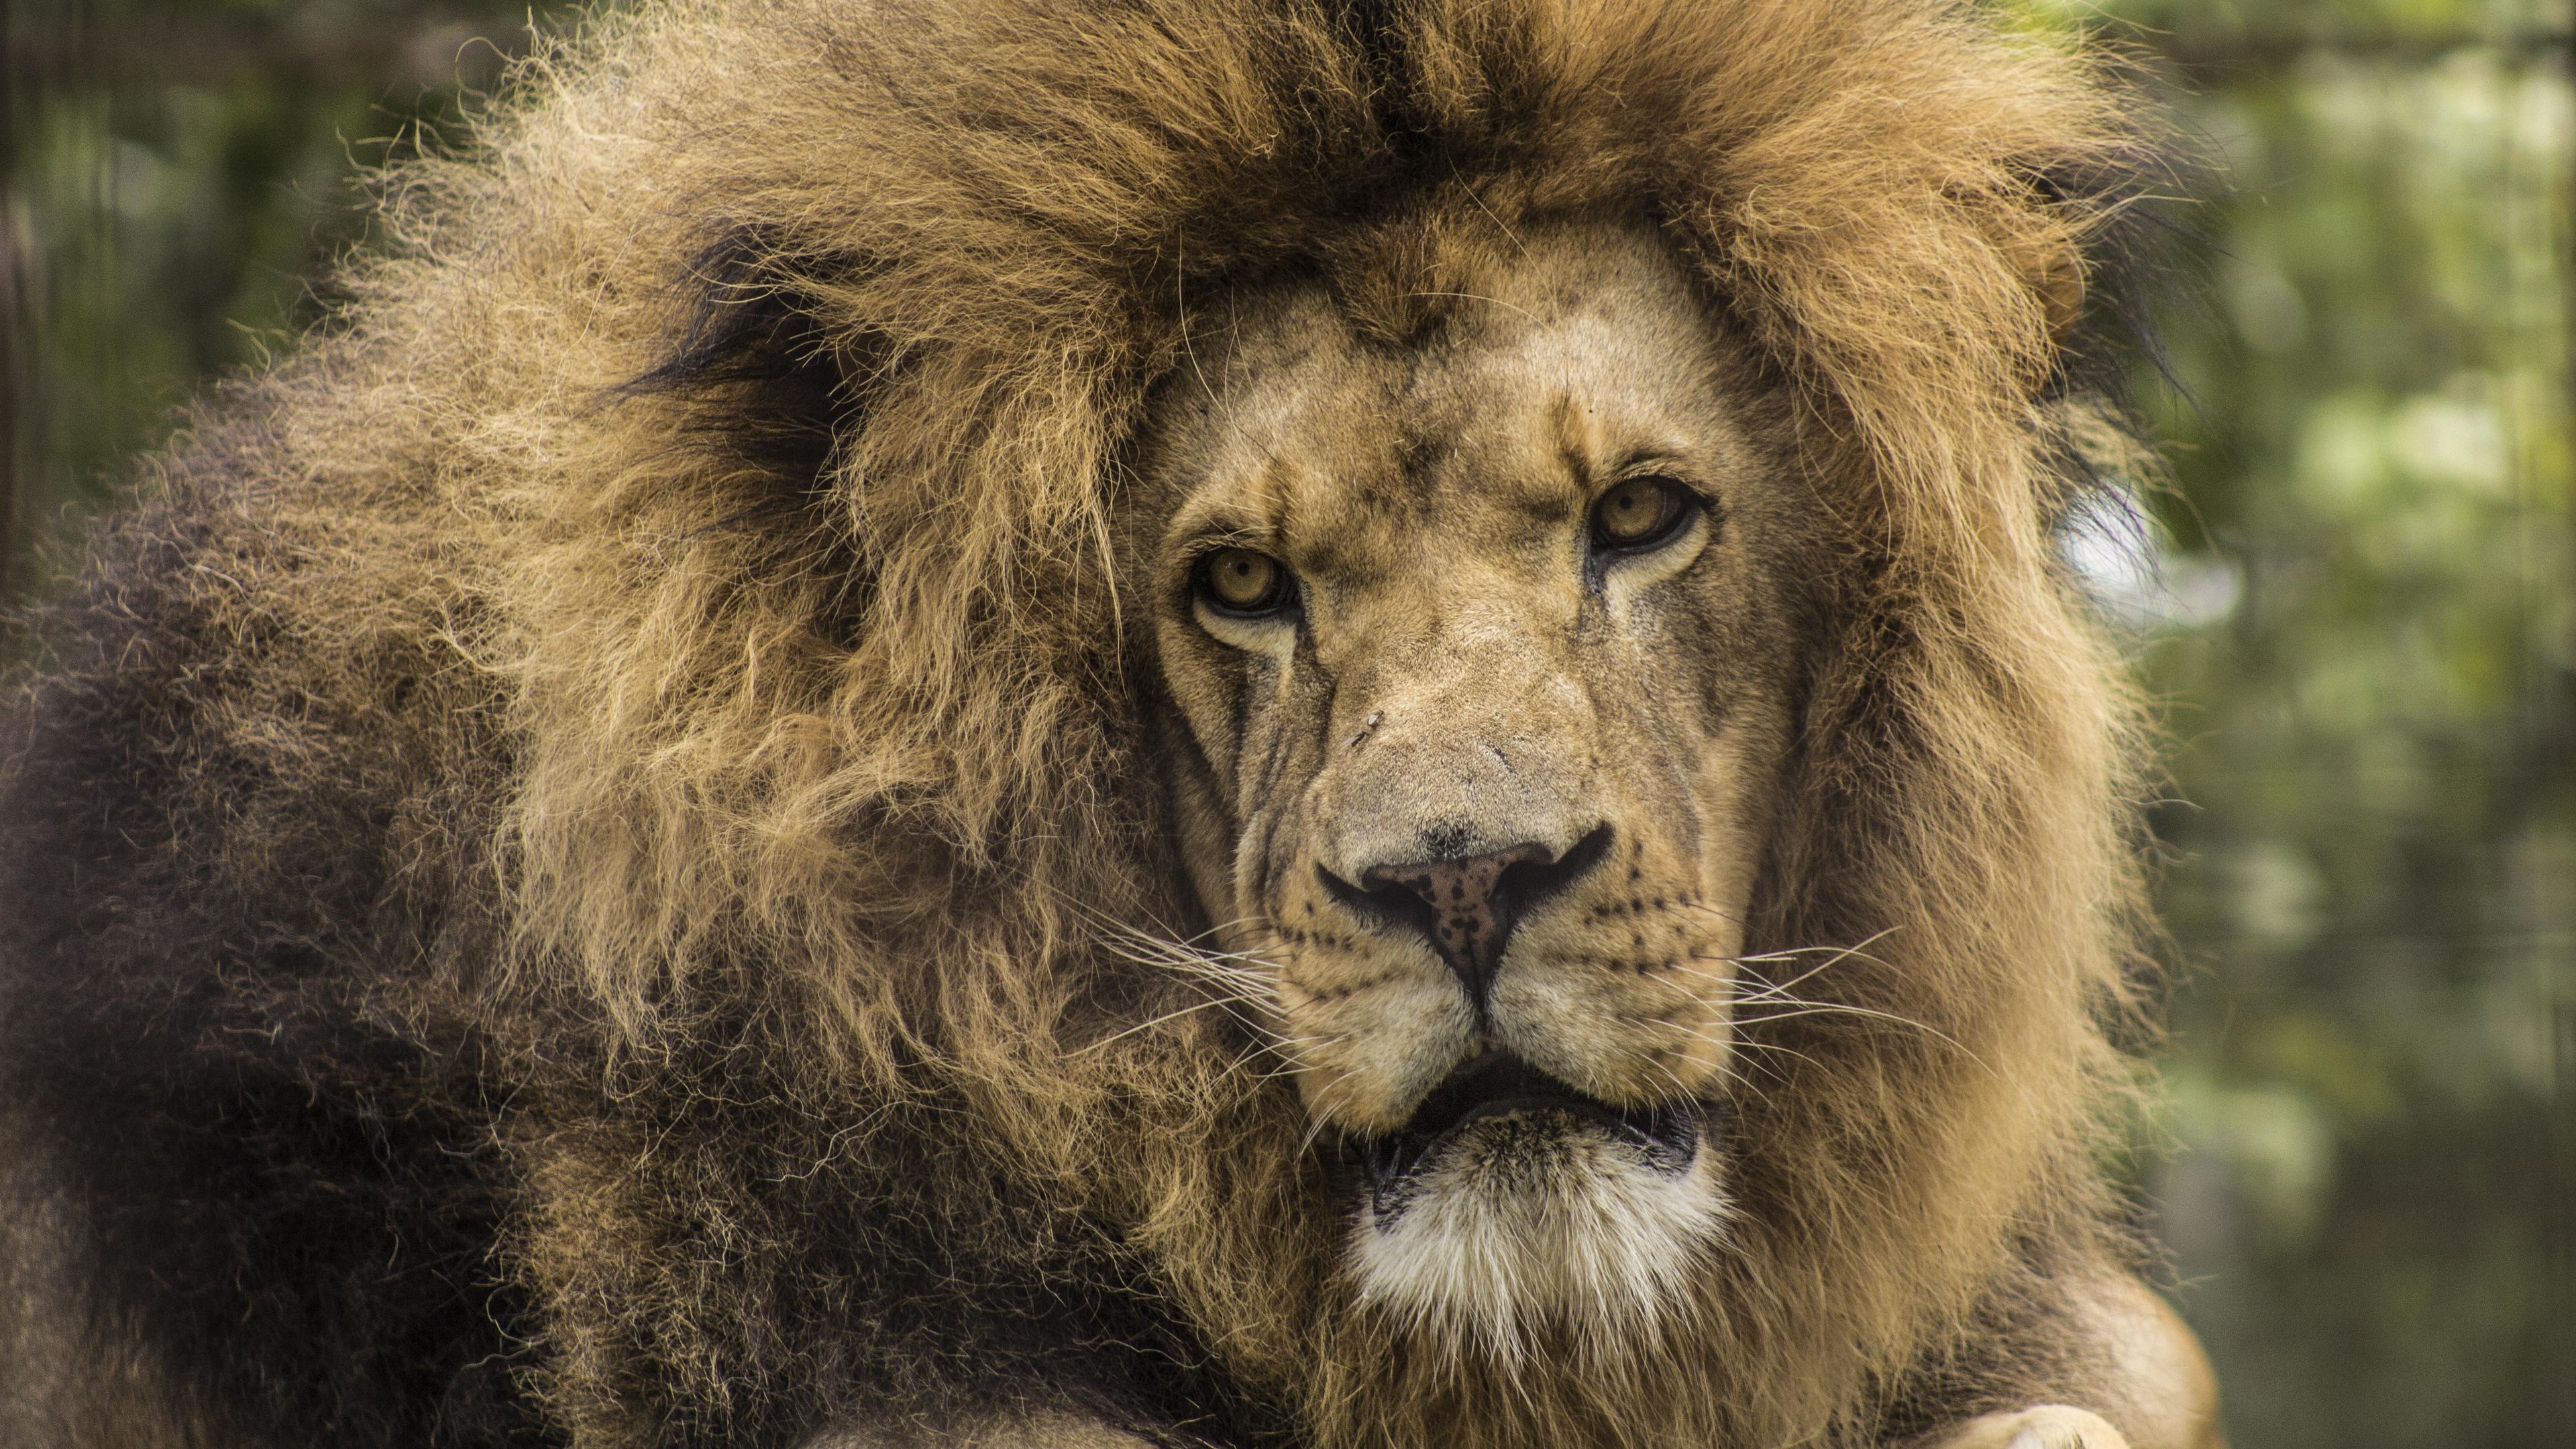 lion predator mane look muzzle 4k 1542242502 - lion, predator, mane, look, muzzle 4k - Predator, mane, Lion